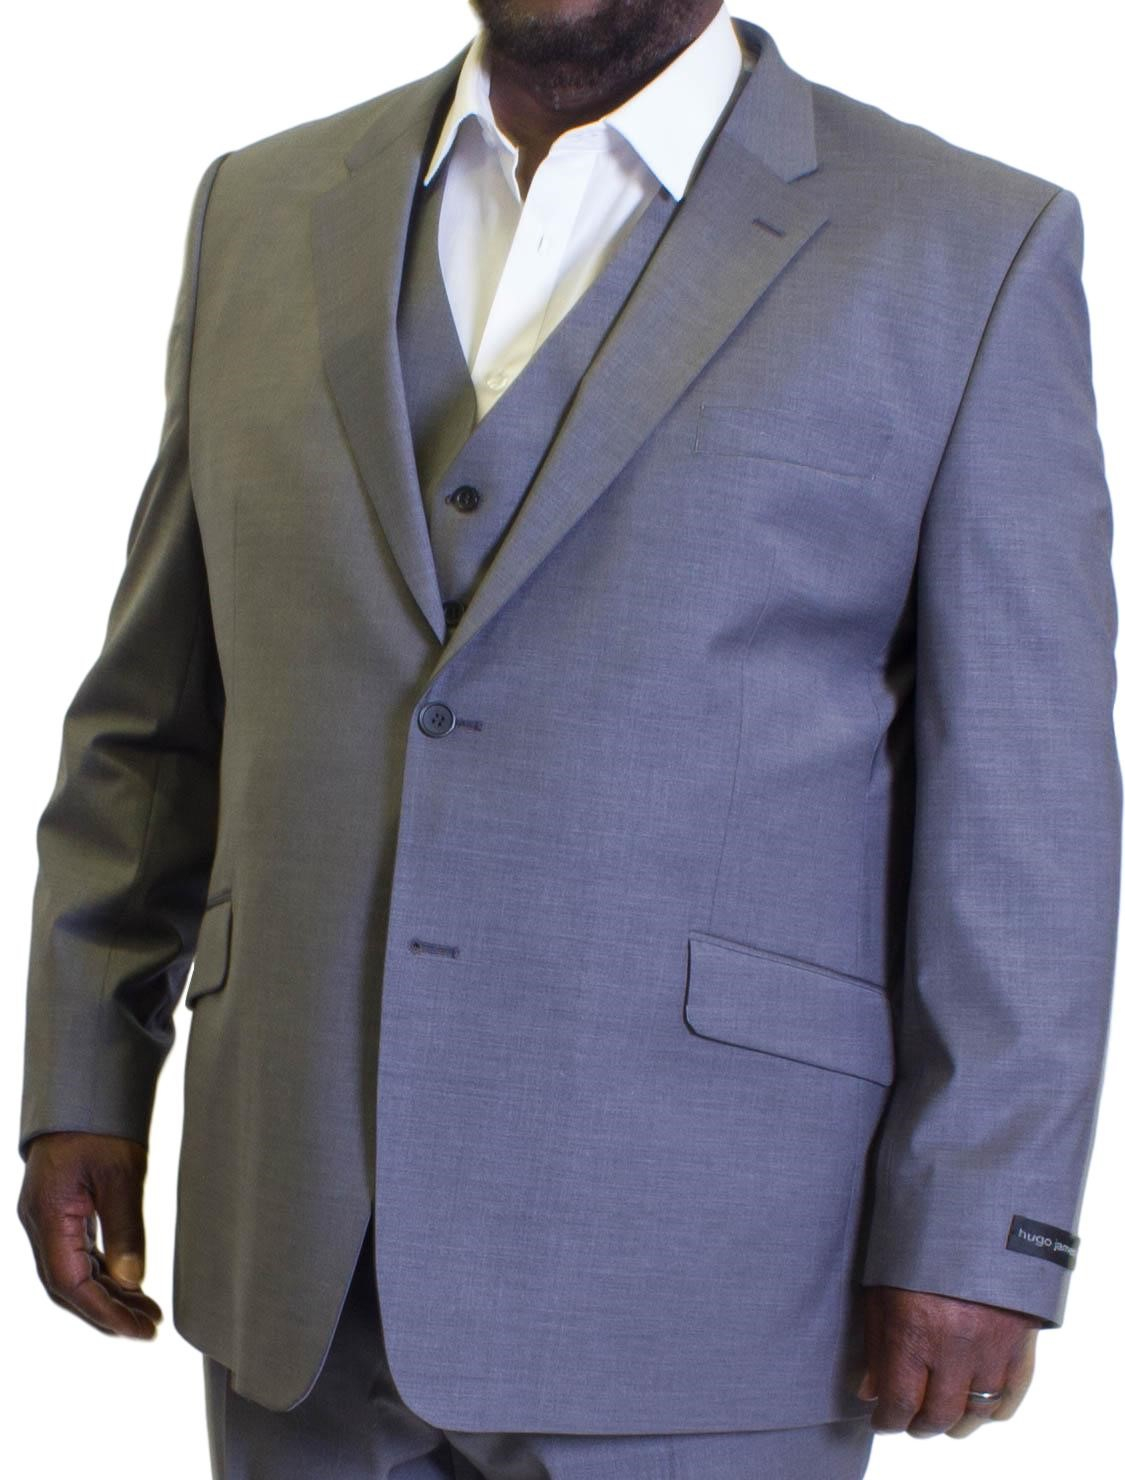 "HUGO JAMES NAVY PINSTRIPE SUIT trousers 42/""44/""46/""48/""50/""52/""54/""56/""58/""60/""62/""64/""66/"""